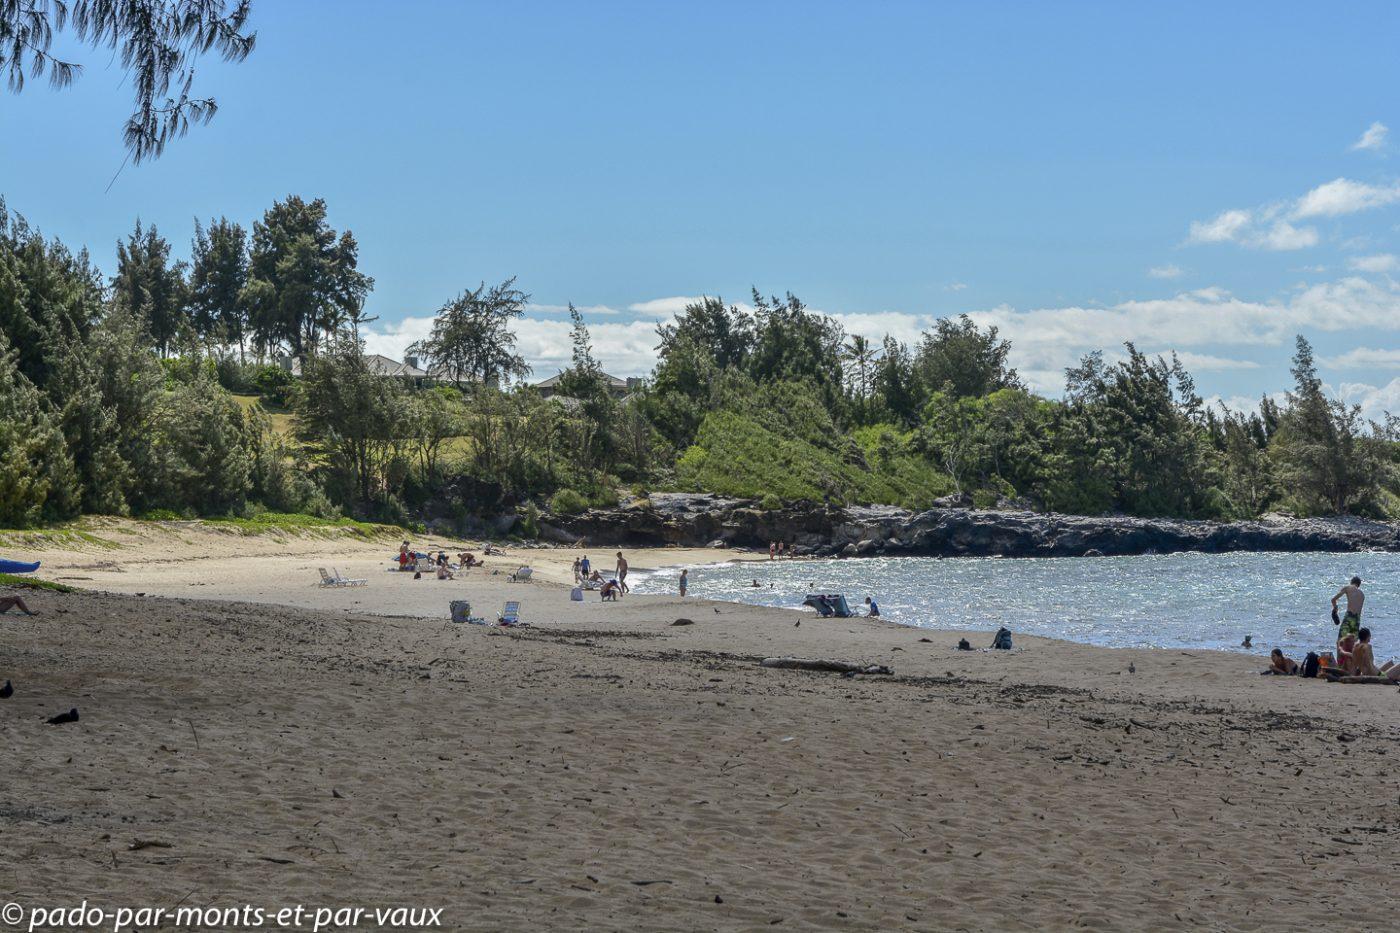 Maui - DT Fleming beach